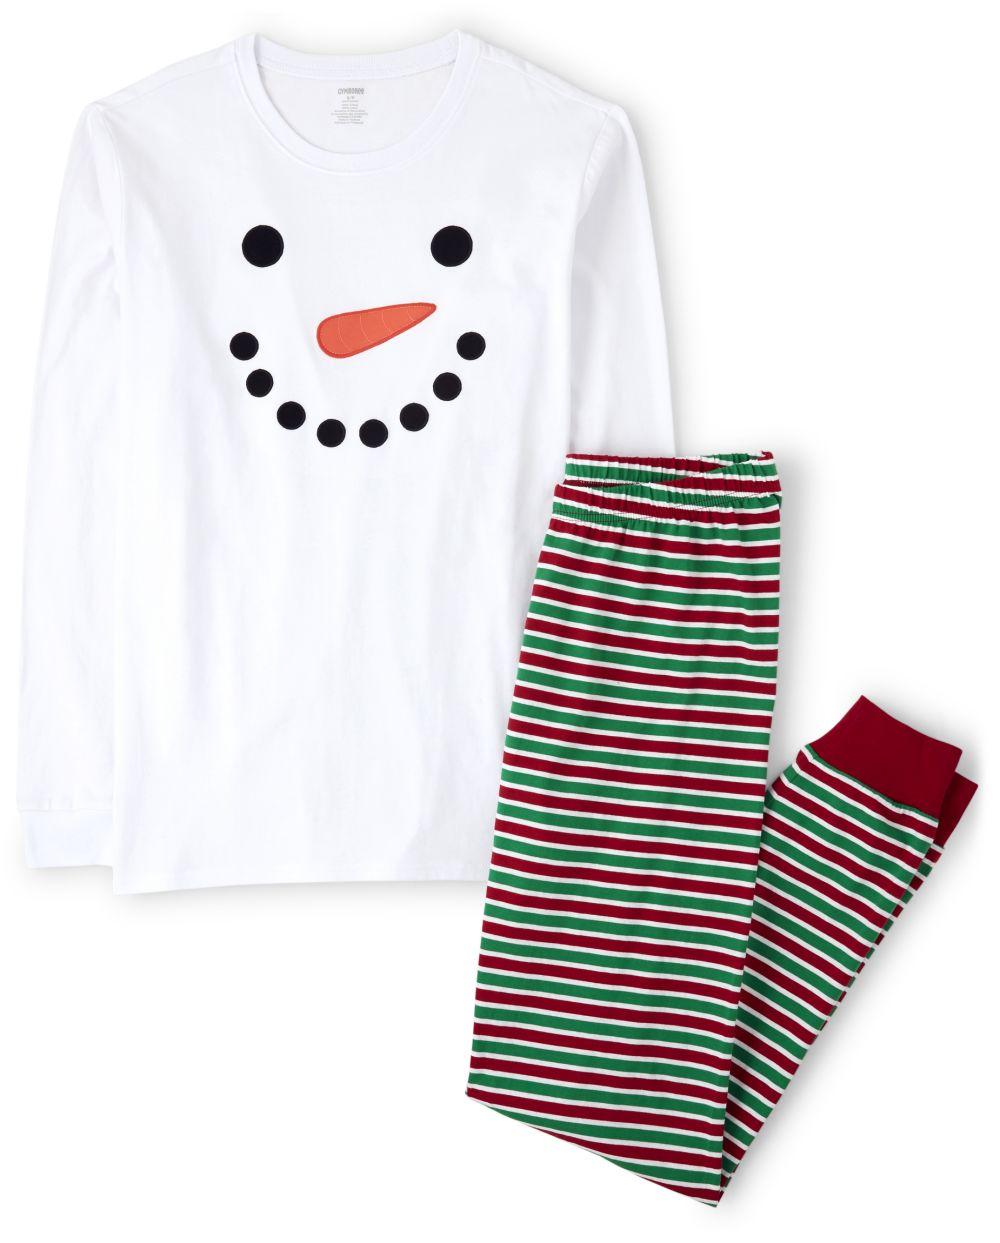 Unisex Adult Matching Family Snowman Cotton 2-Piece Pajamas - Gymmies